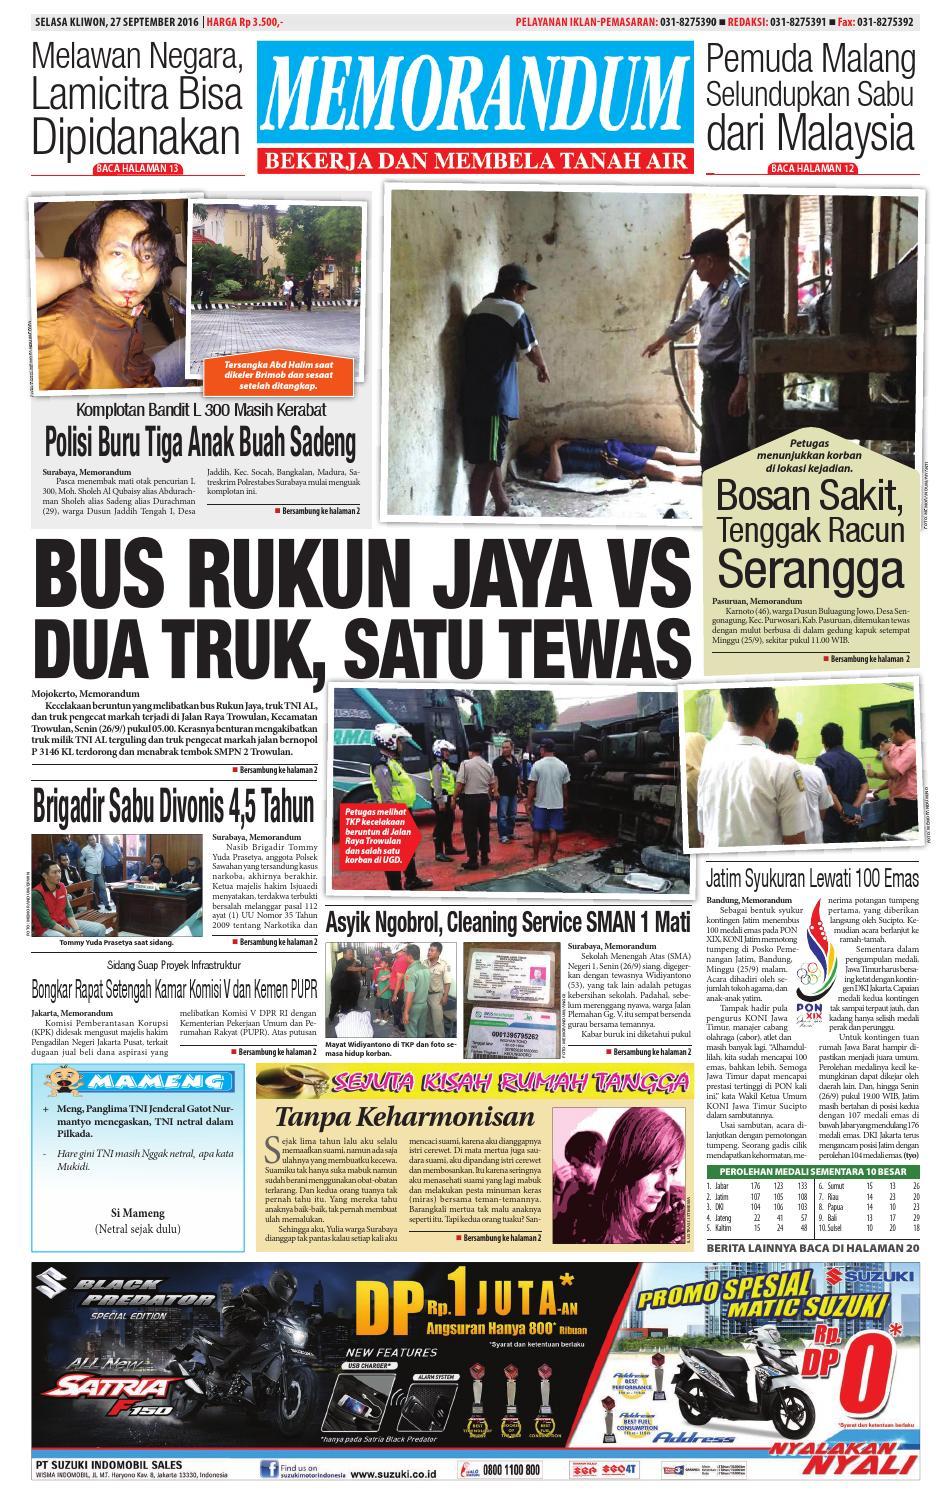 Edisi 27 September 2016 By Memorandum Issuu Produk Ukm Bumn Tas Phiton Kembang Orchid